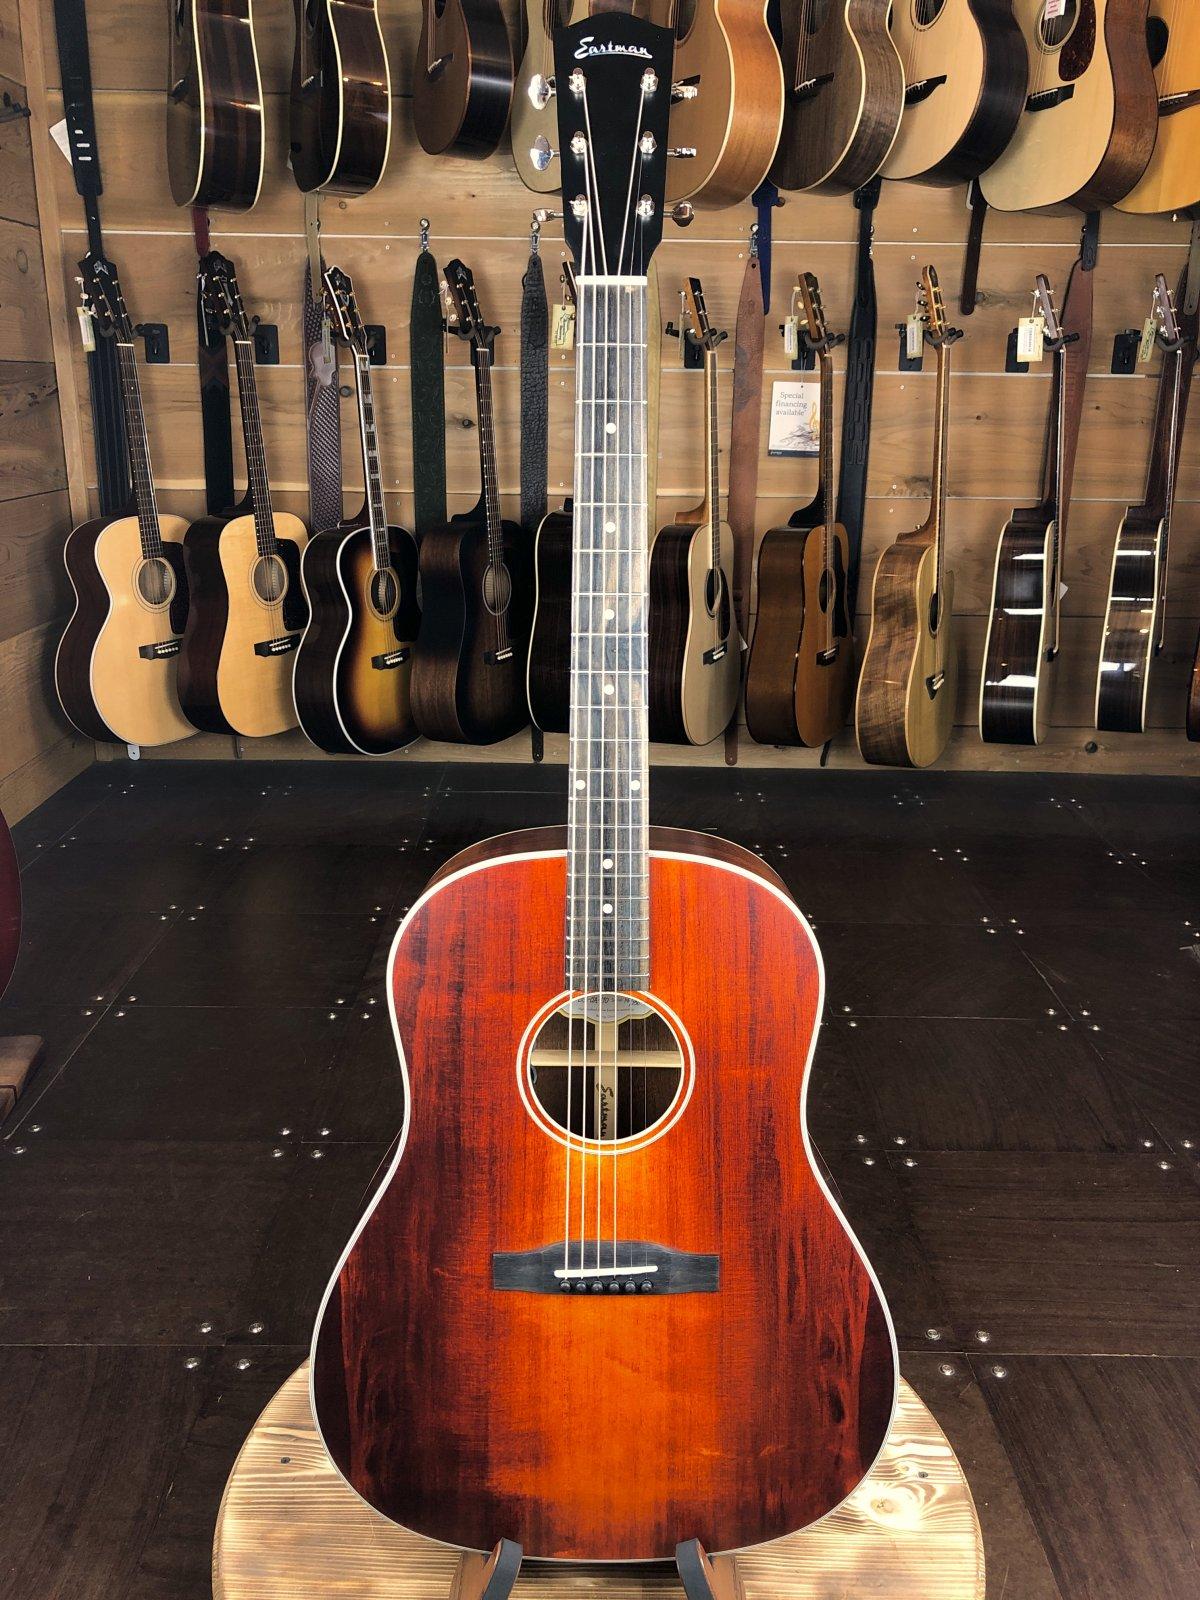 Eastman E1SS-LTD-CLA Slope Shoulder Adirondack Top Limited Edition Dreadnaught Acoustic #116/250